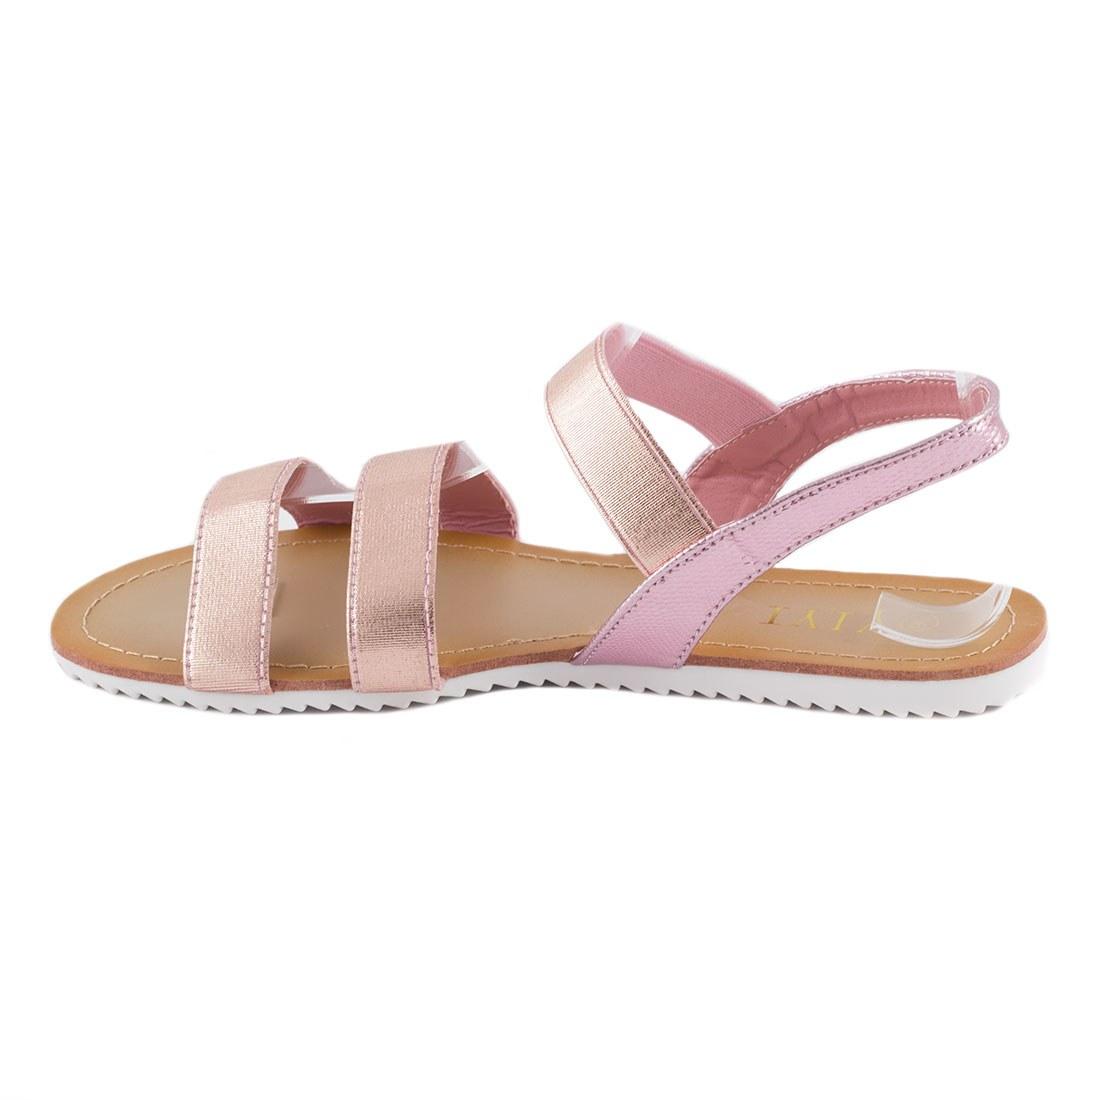 Sandale dama cu talpa joasa K-58-SILVER la 29,99Lei - Zibra.ro